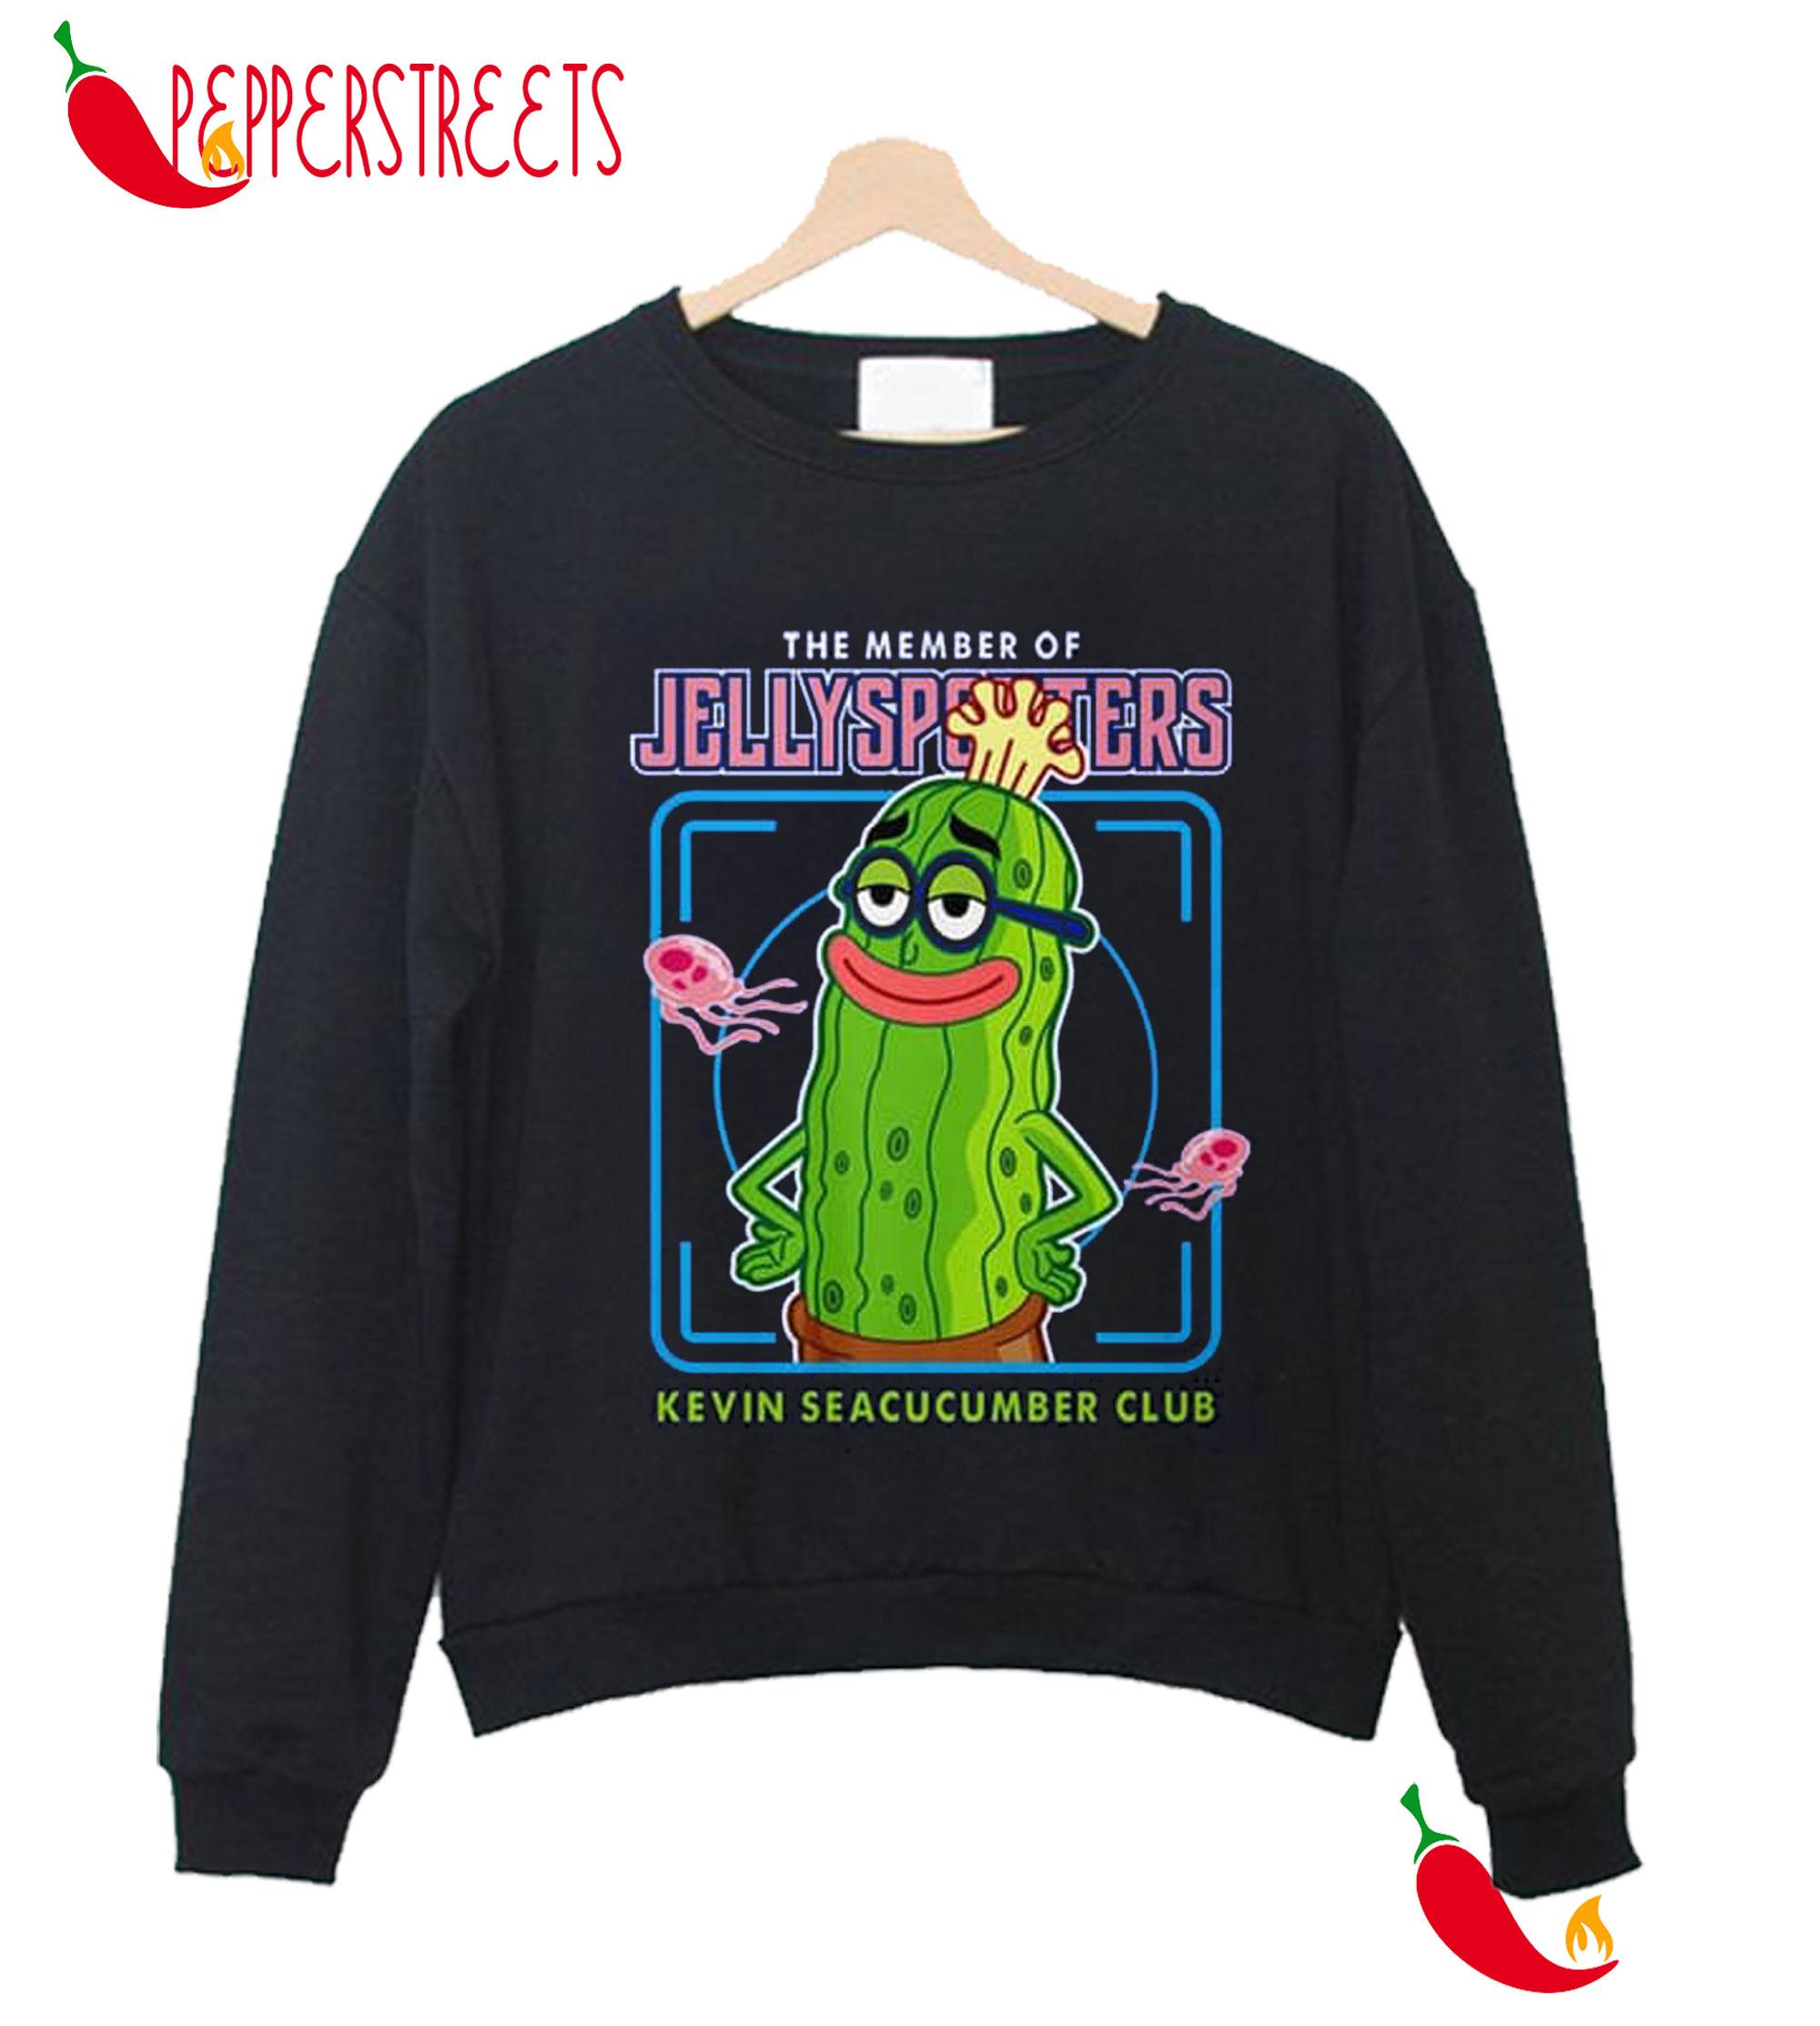 The Member Of Jellysporsters Kevin Seacucumber Club Sweatshirt